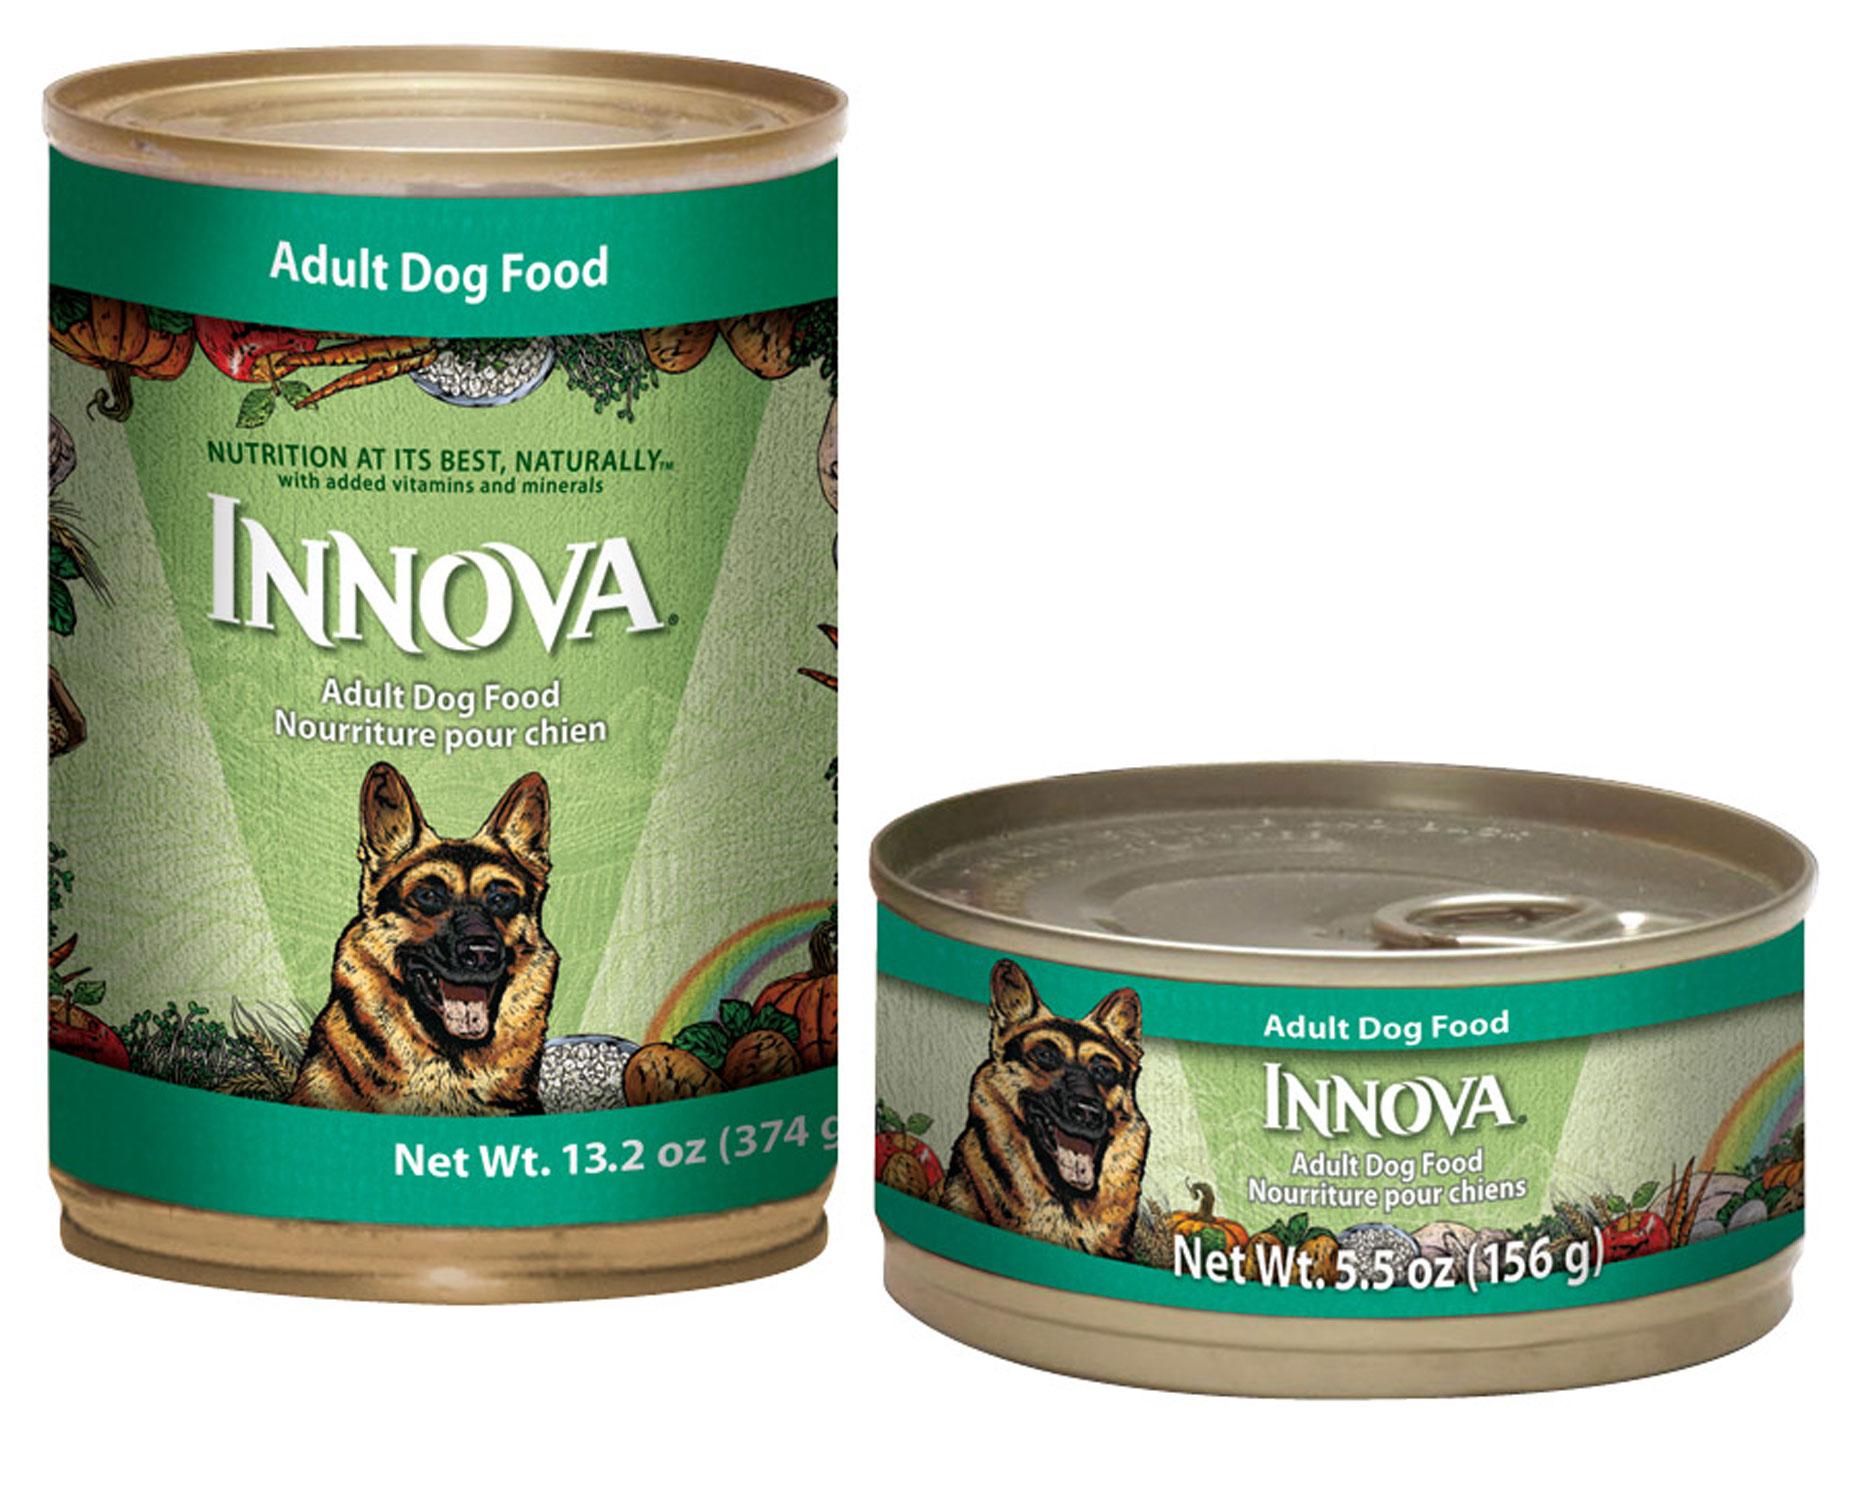 Innova Puppy Canned Dog Food